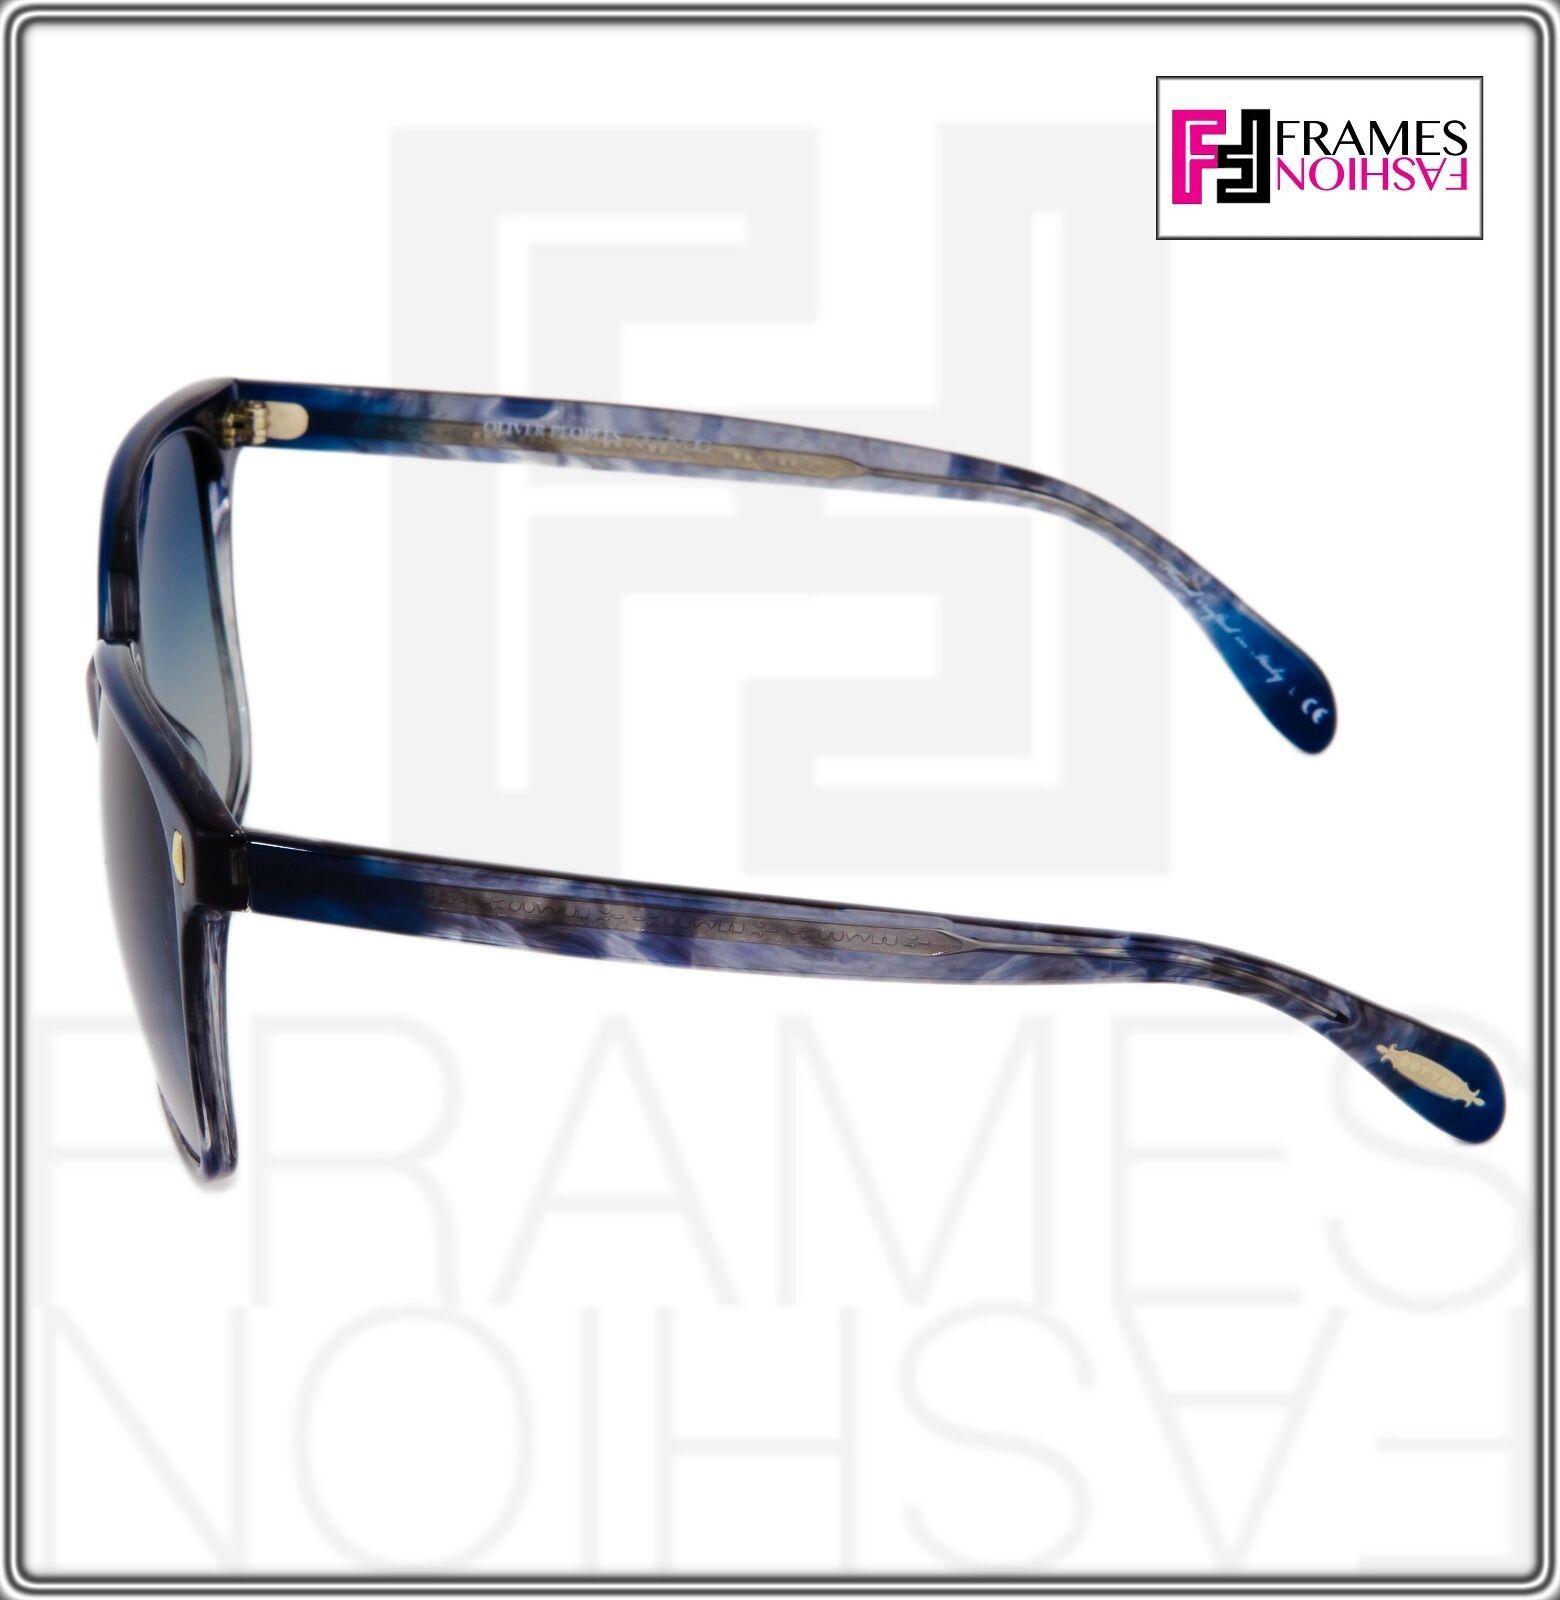 OLIVER PEOPLES MARMOT Square OV5266S Faded Sea Pacific Blue Sunglasses 5266 image 4